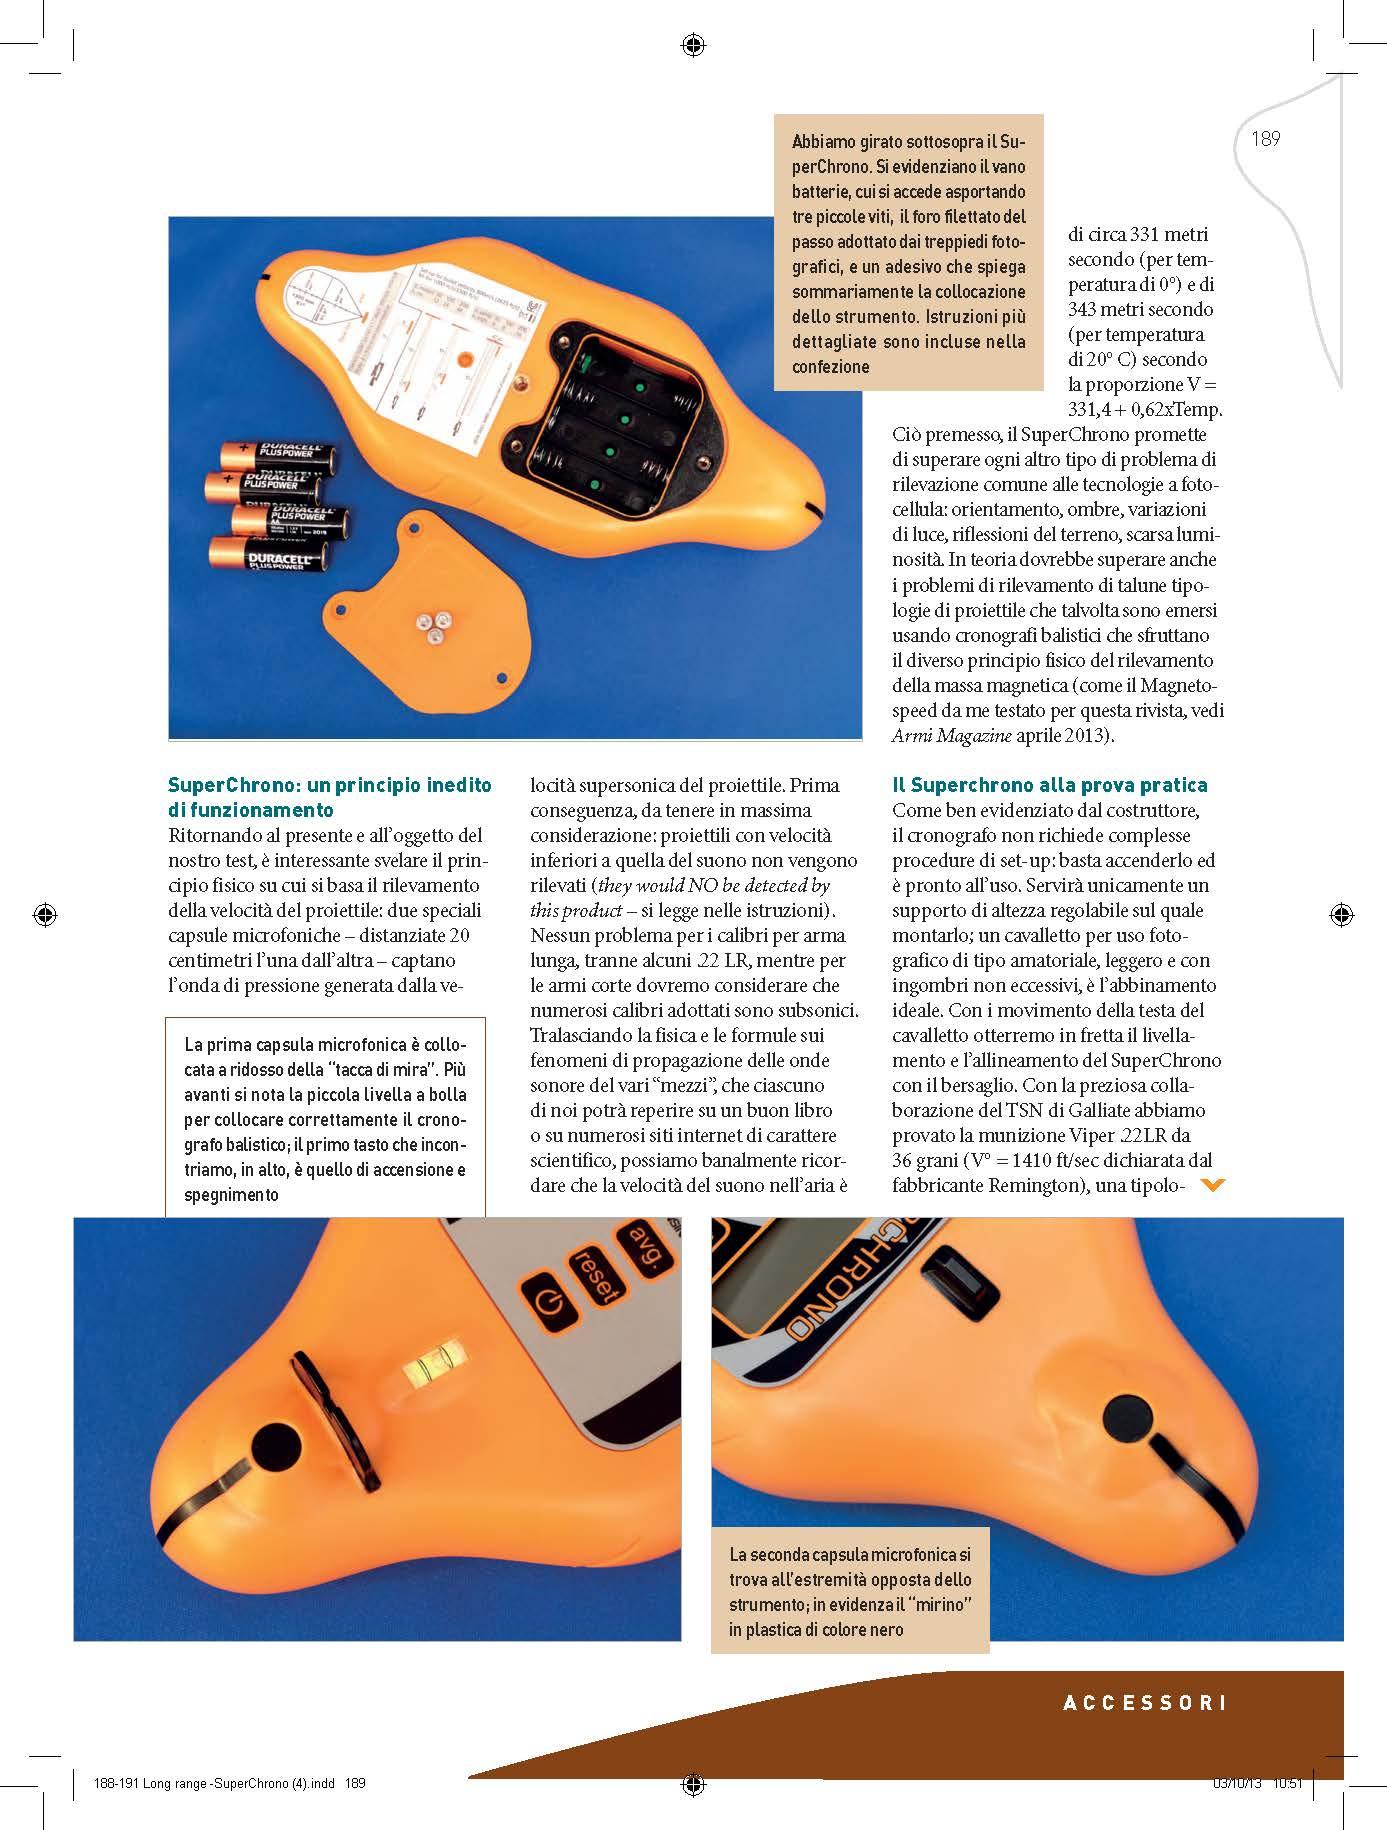 Armi Magazine November 2013 (3)_Page_2